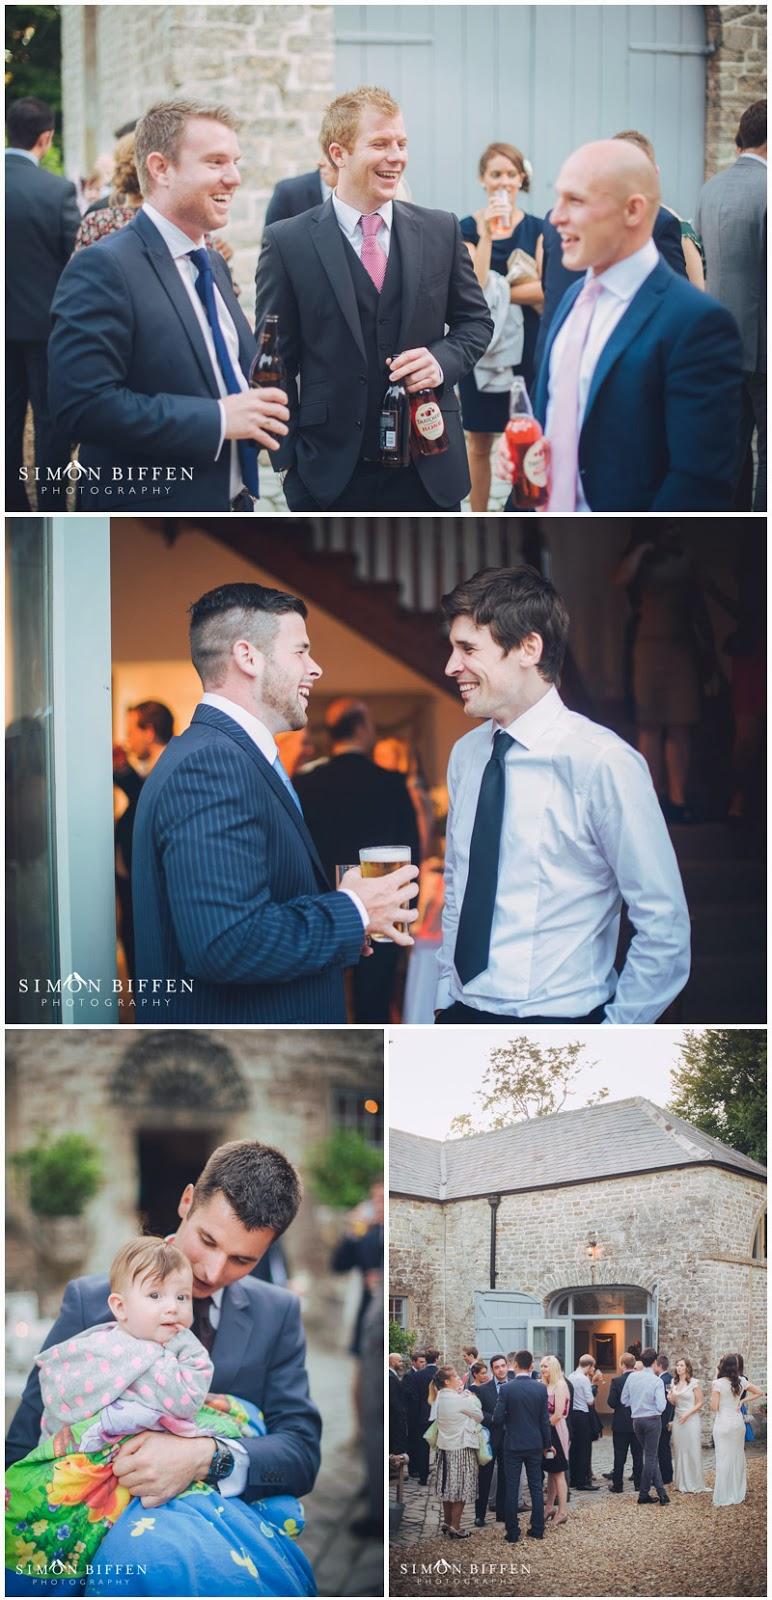 Wedding reception at Pennard House